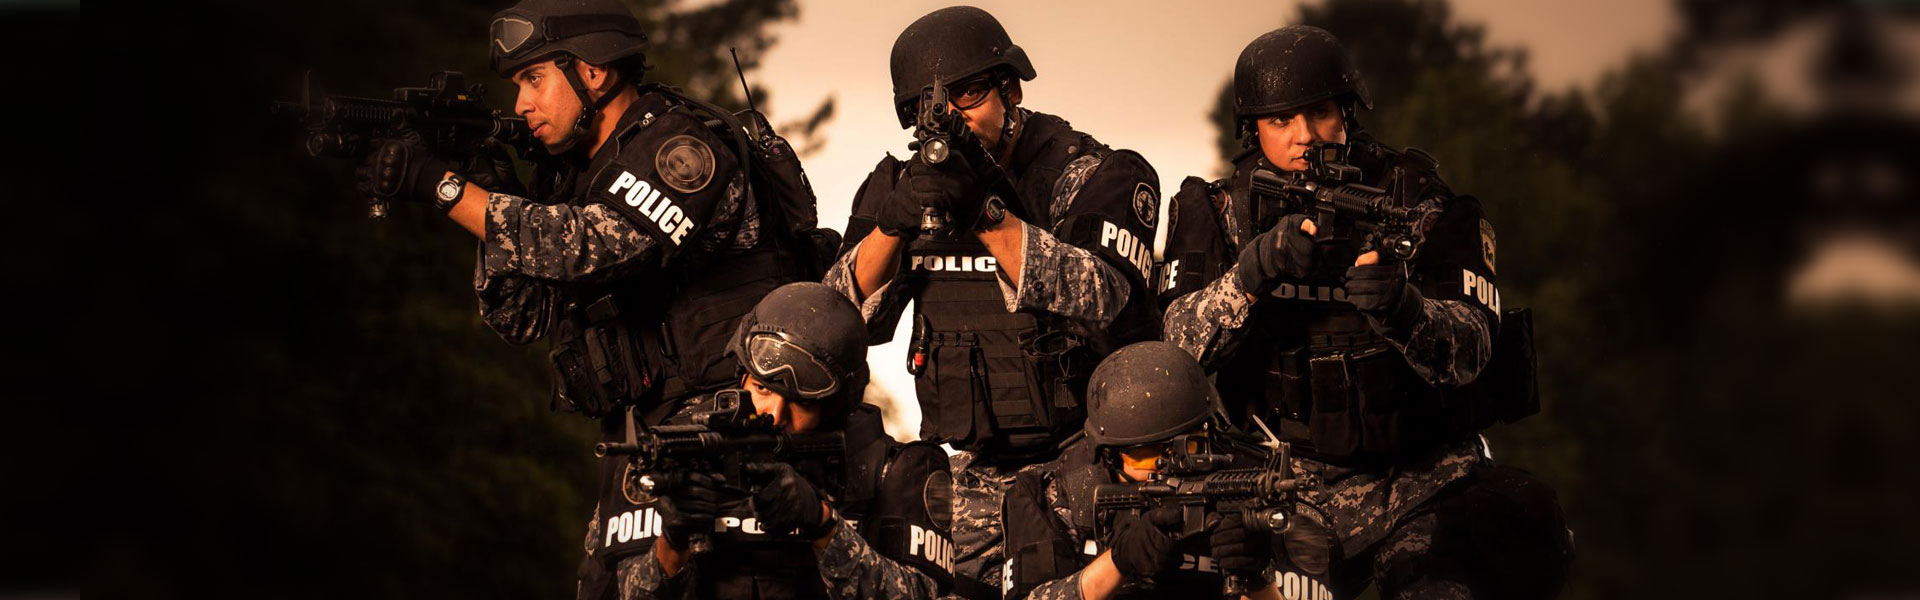 front-banner-swat.jpg